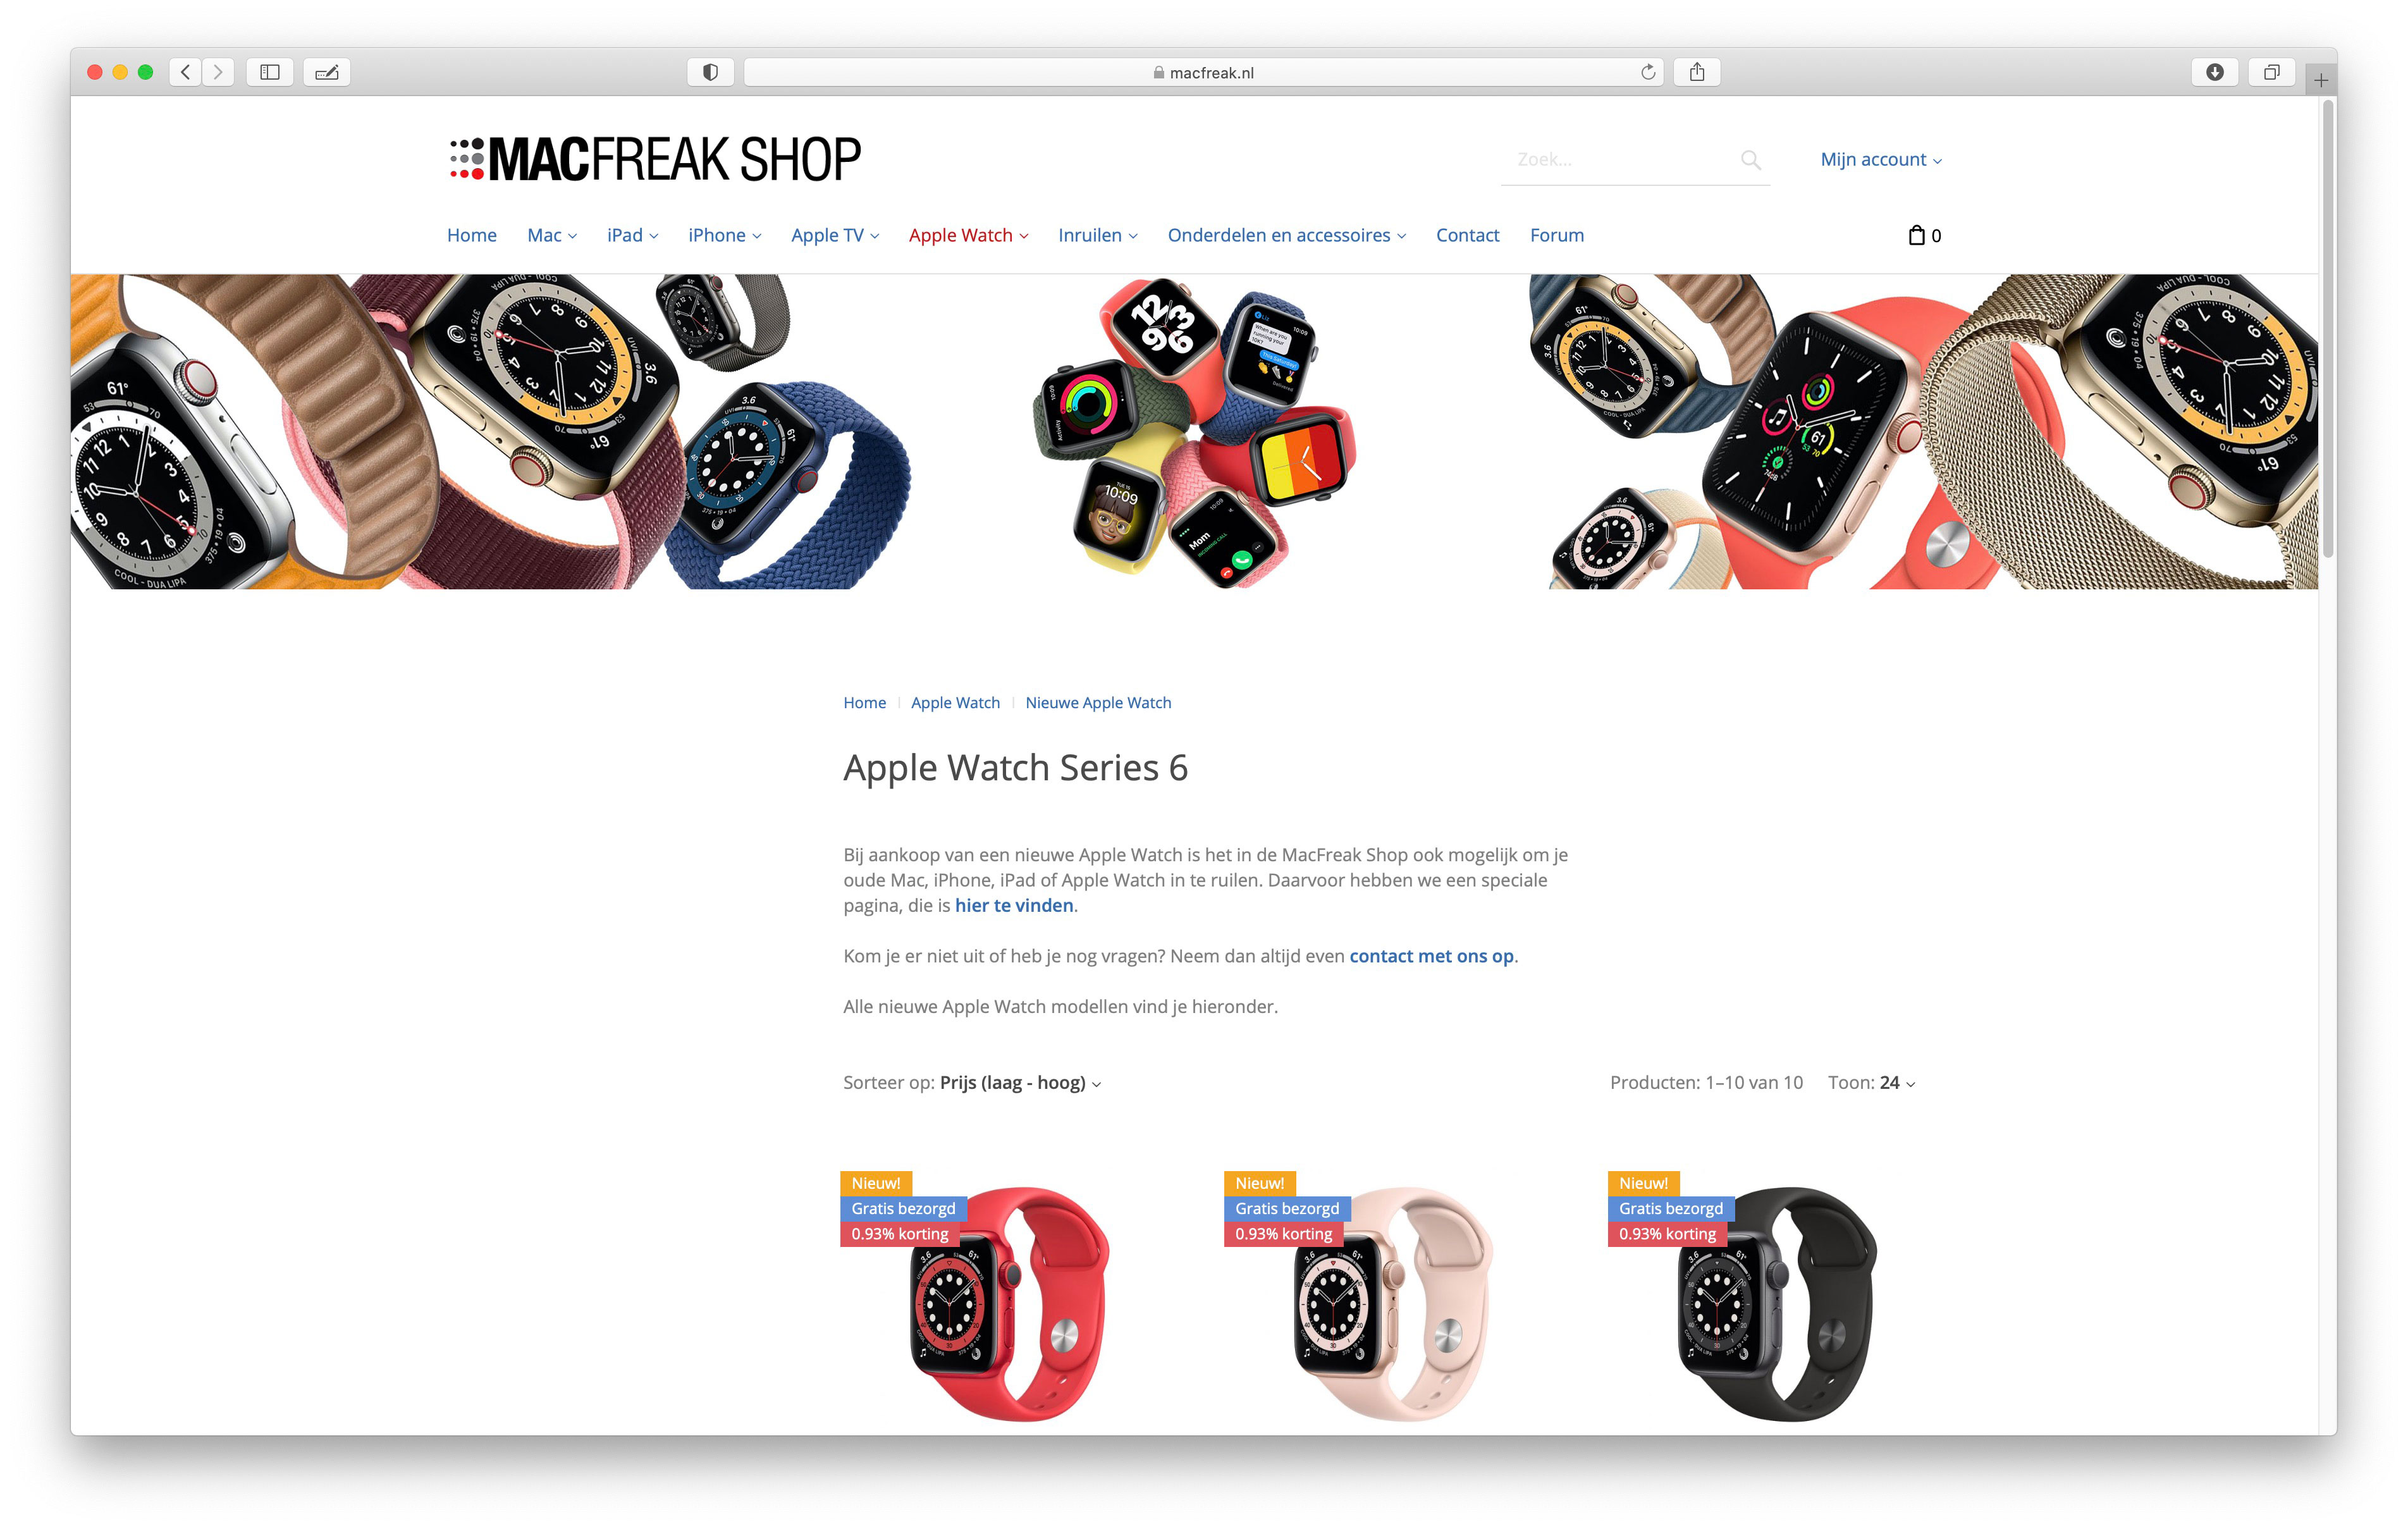 https://www.macfreak.nl/modules/news/images/zArt.MacFreakShopNieuweAppleWatch.jpg